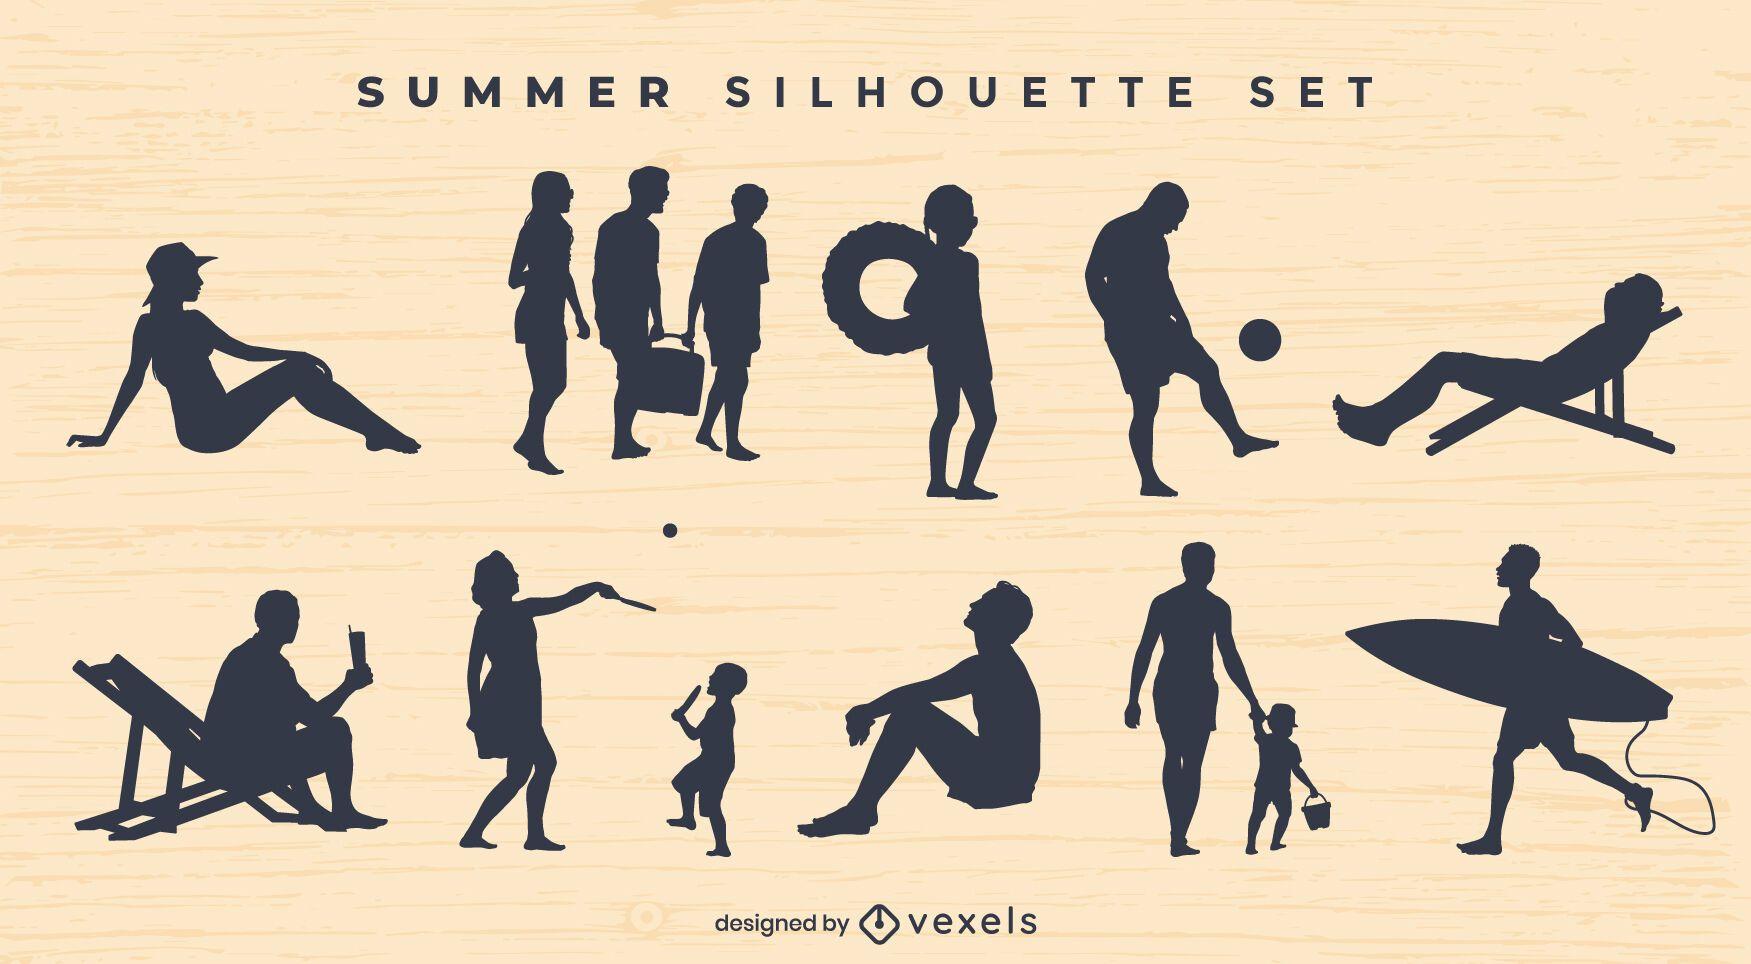 Beach people silhouette set